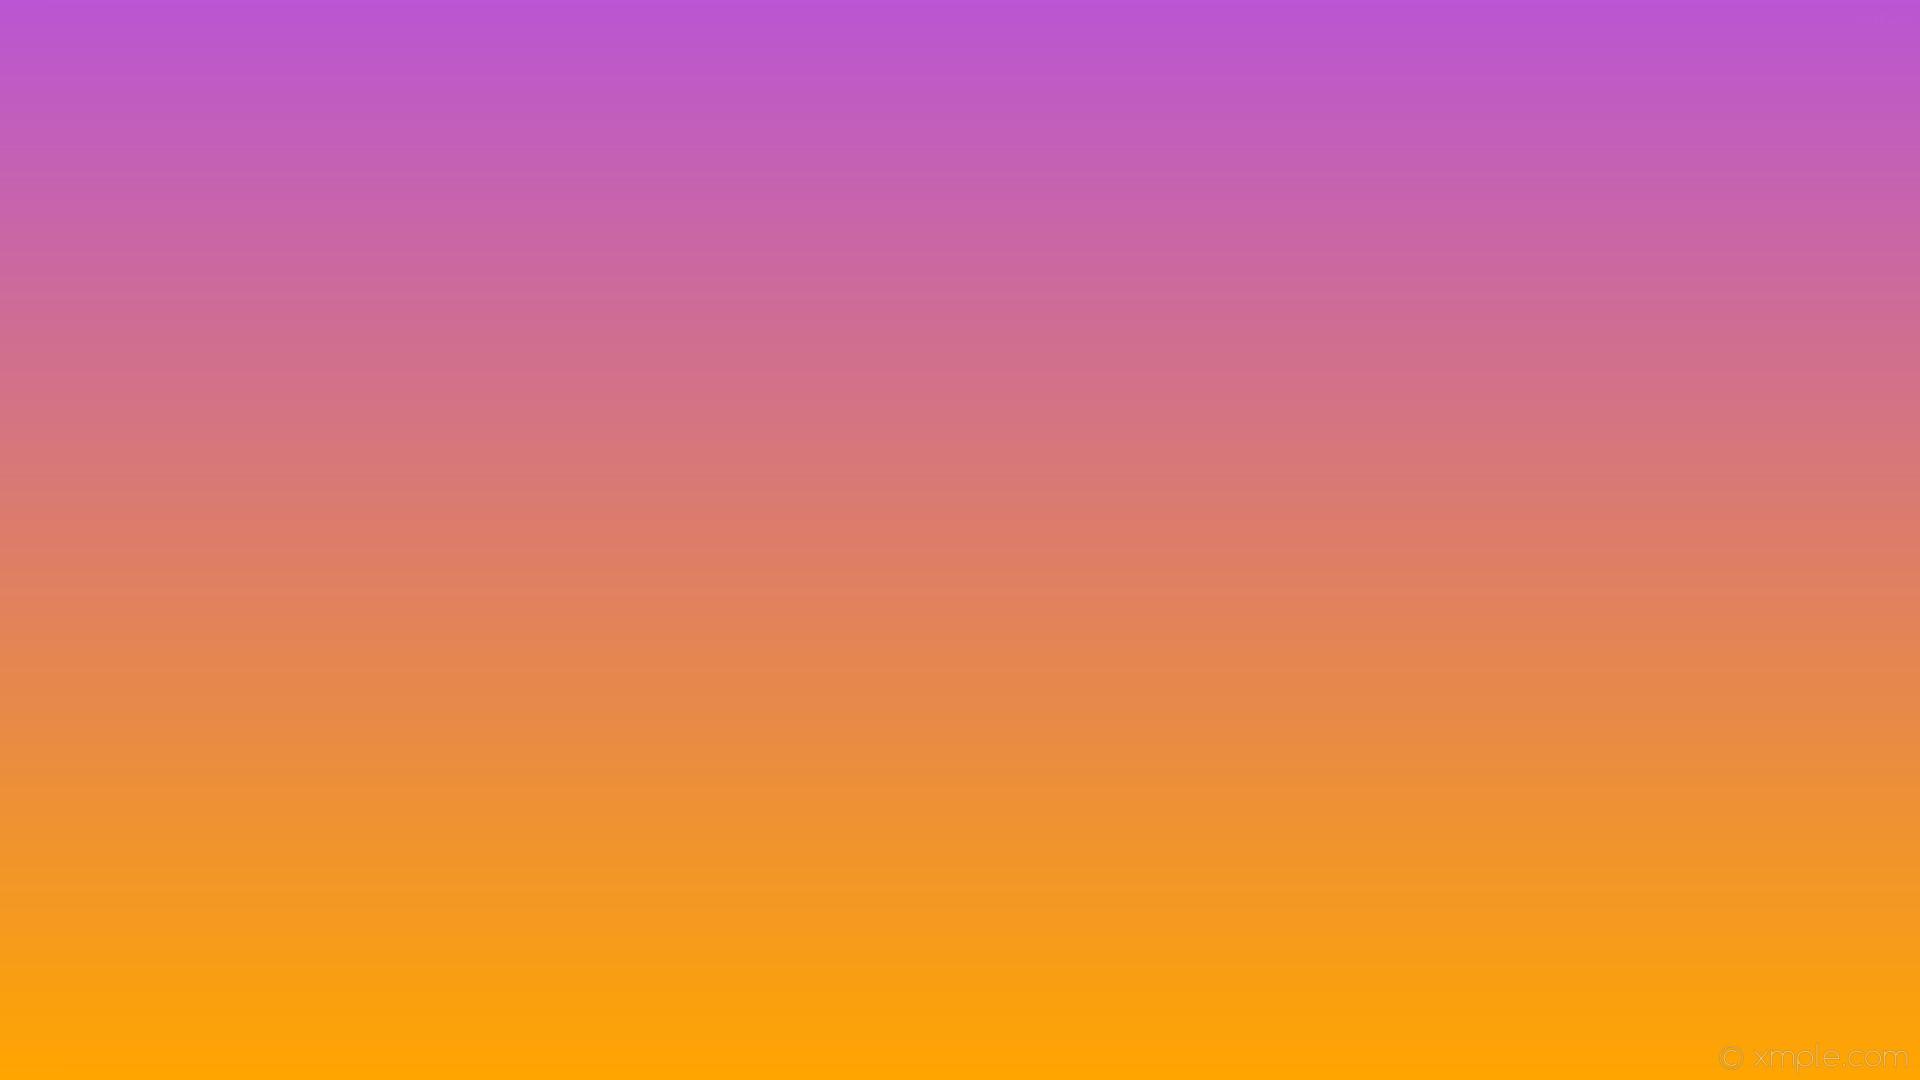 wallpaper orange purple gradient linear medium orchid #ba55d3 #ffa500 90°